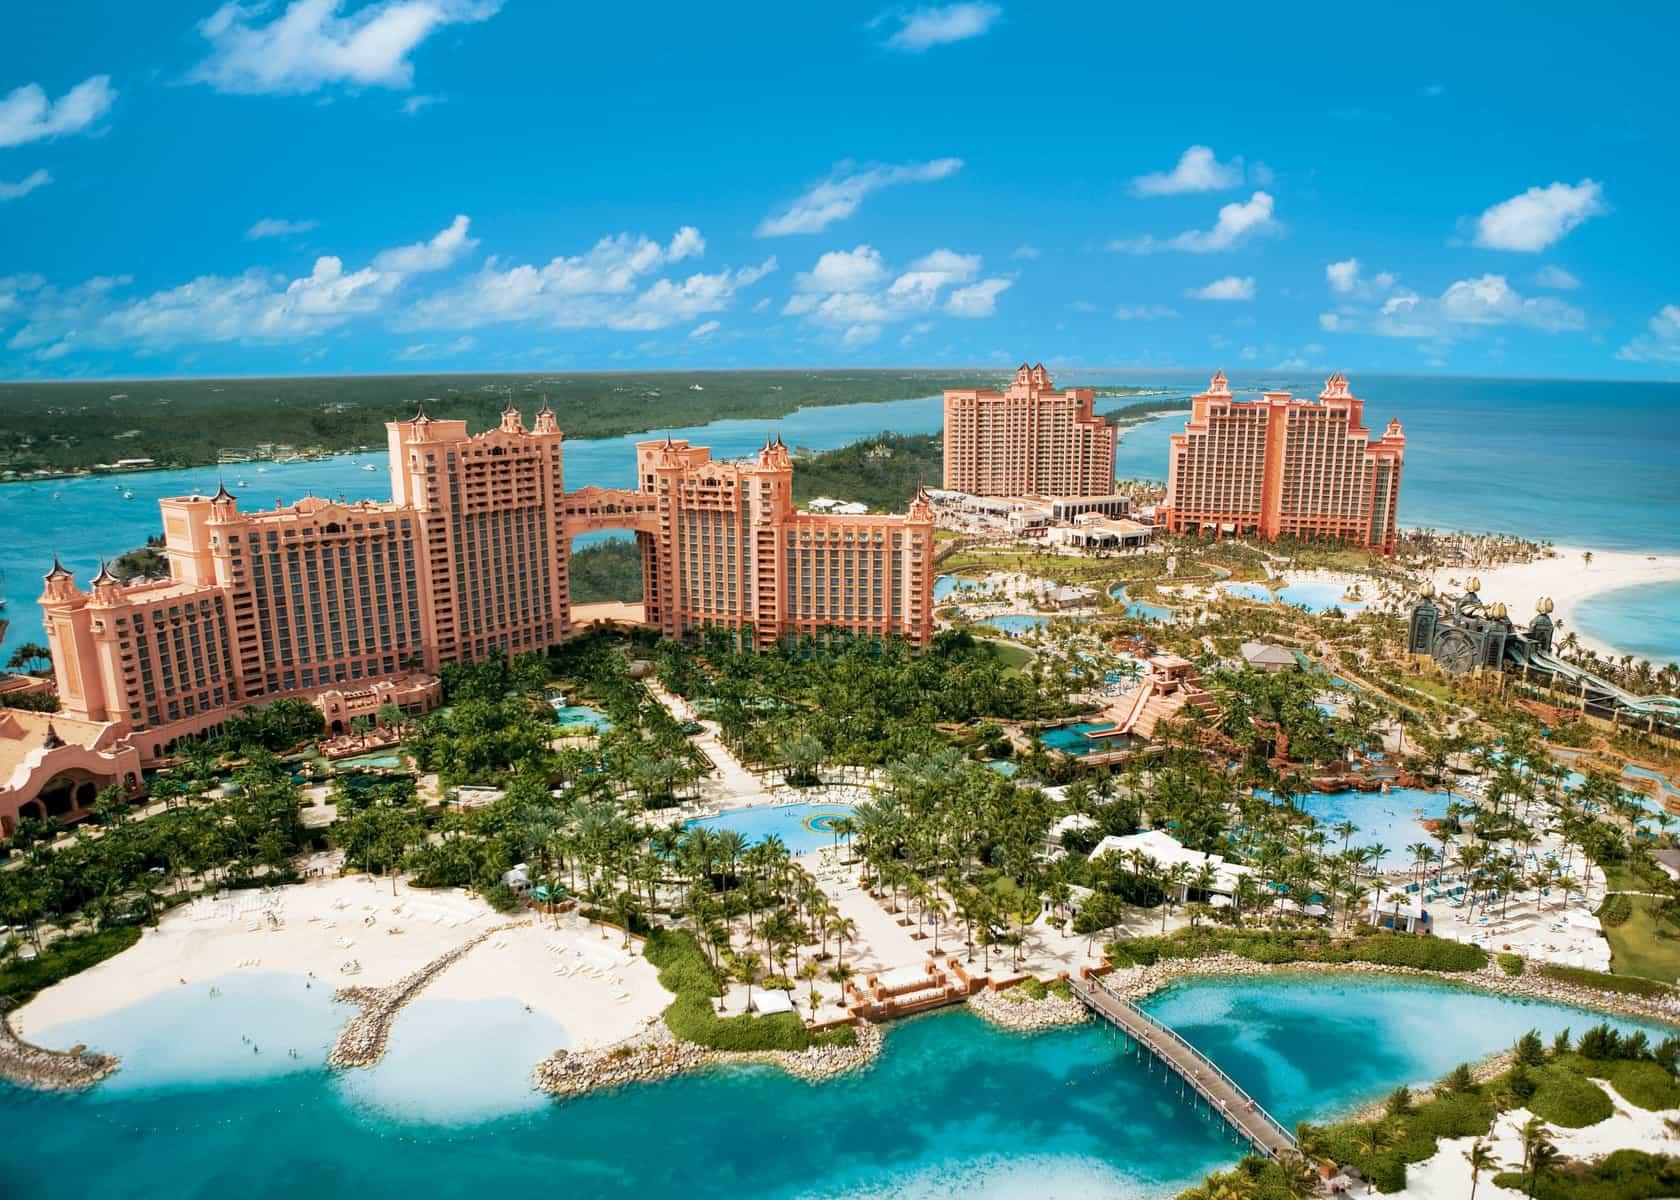 The Bahamas Atlantis